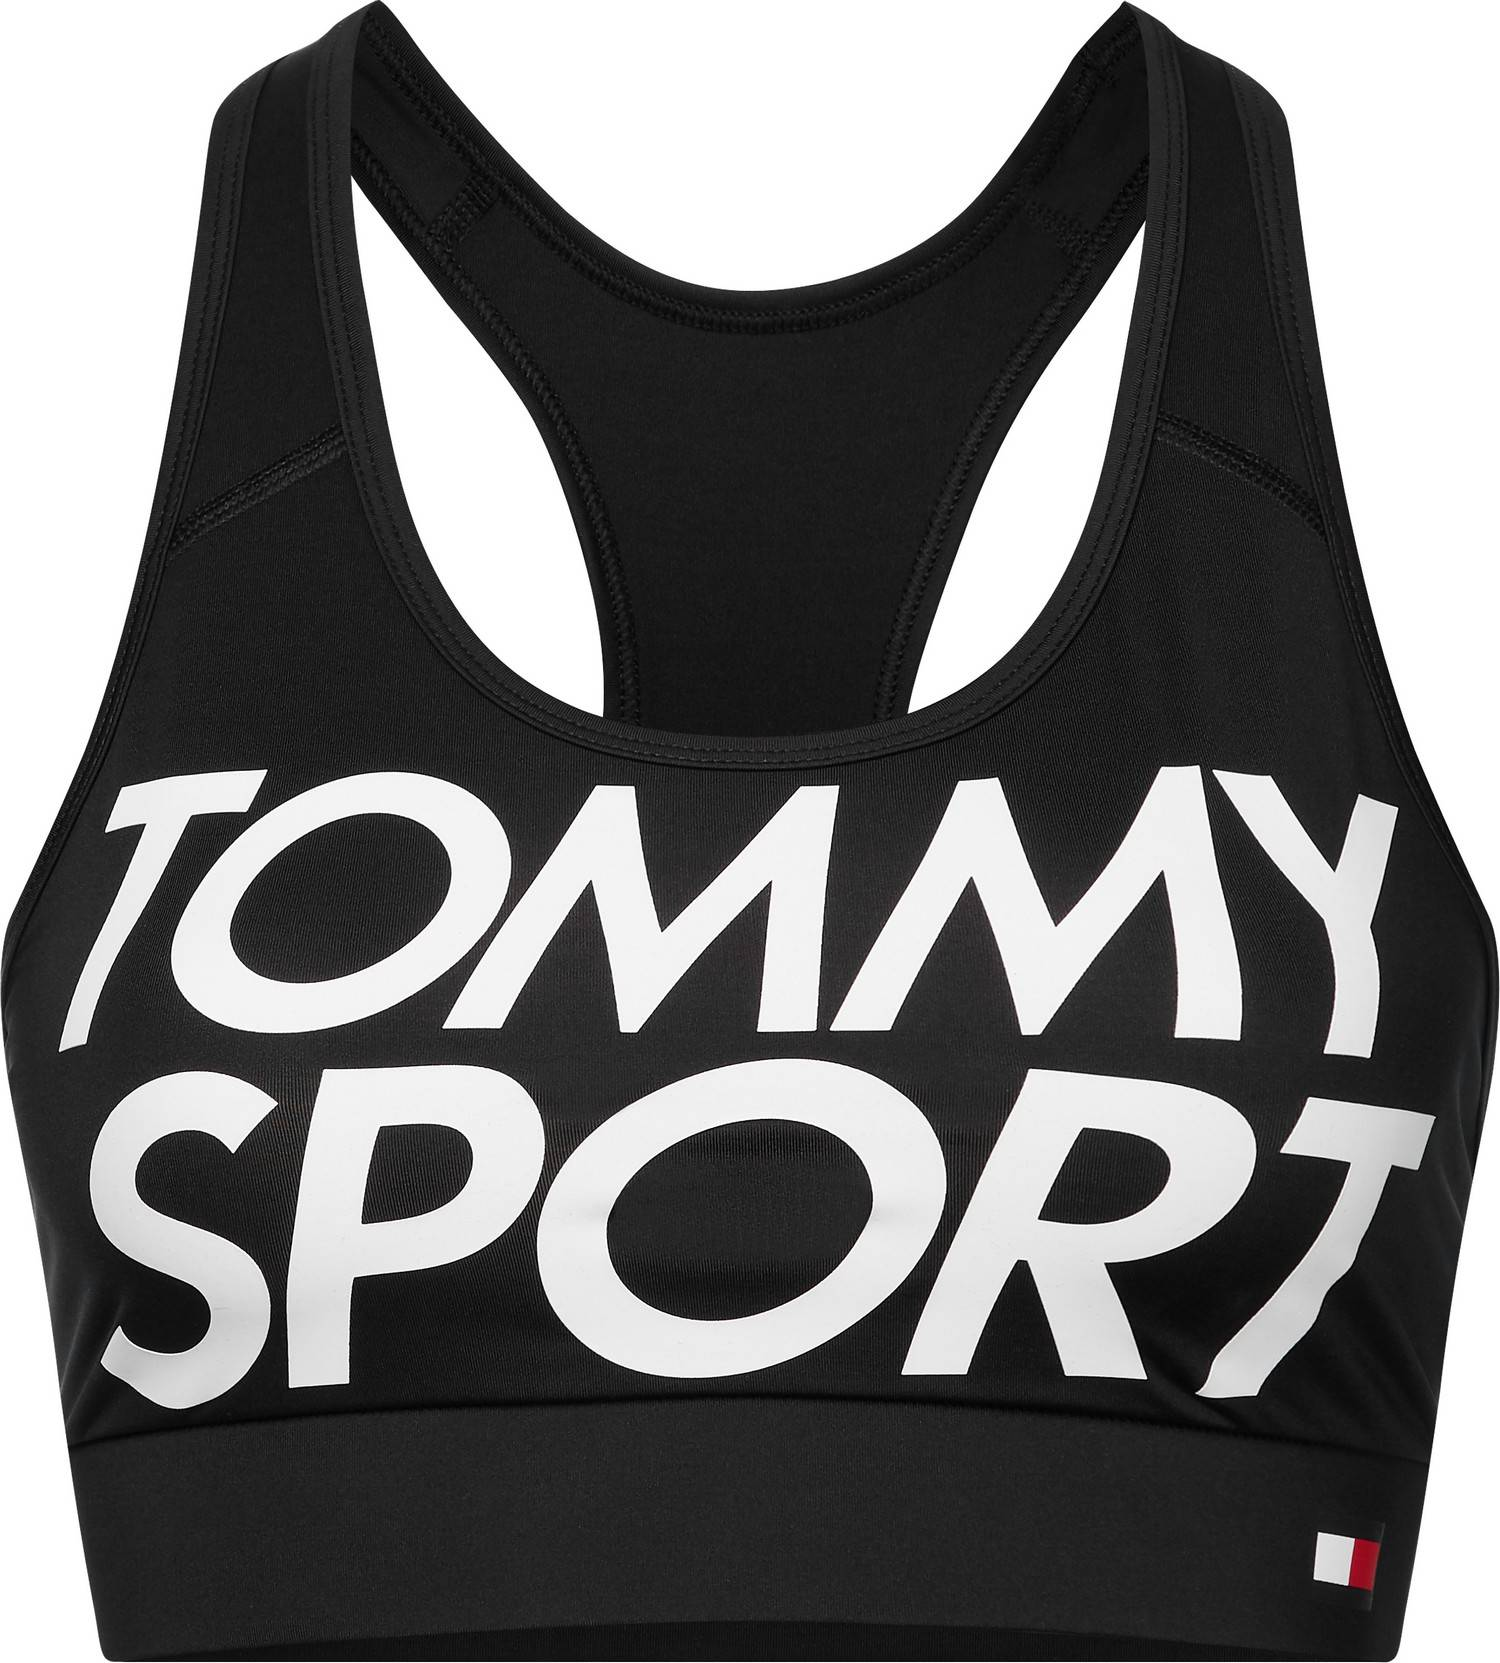 Image of Tommy Sport Naisten Urheiluliivit, Sports Bra Logo Musta